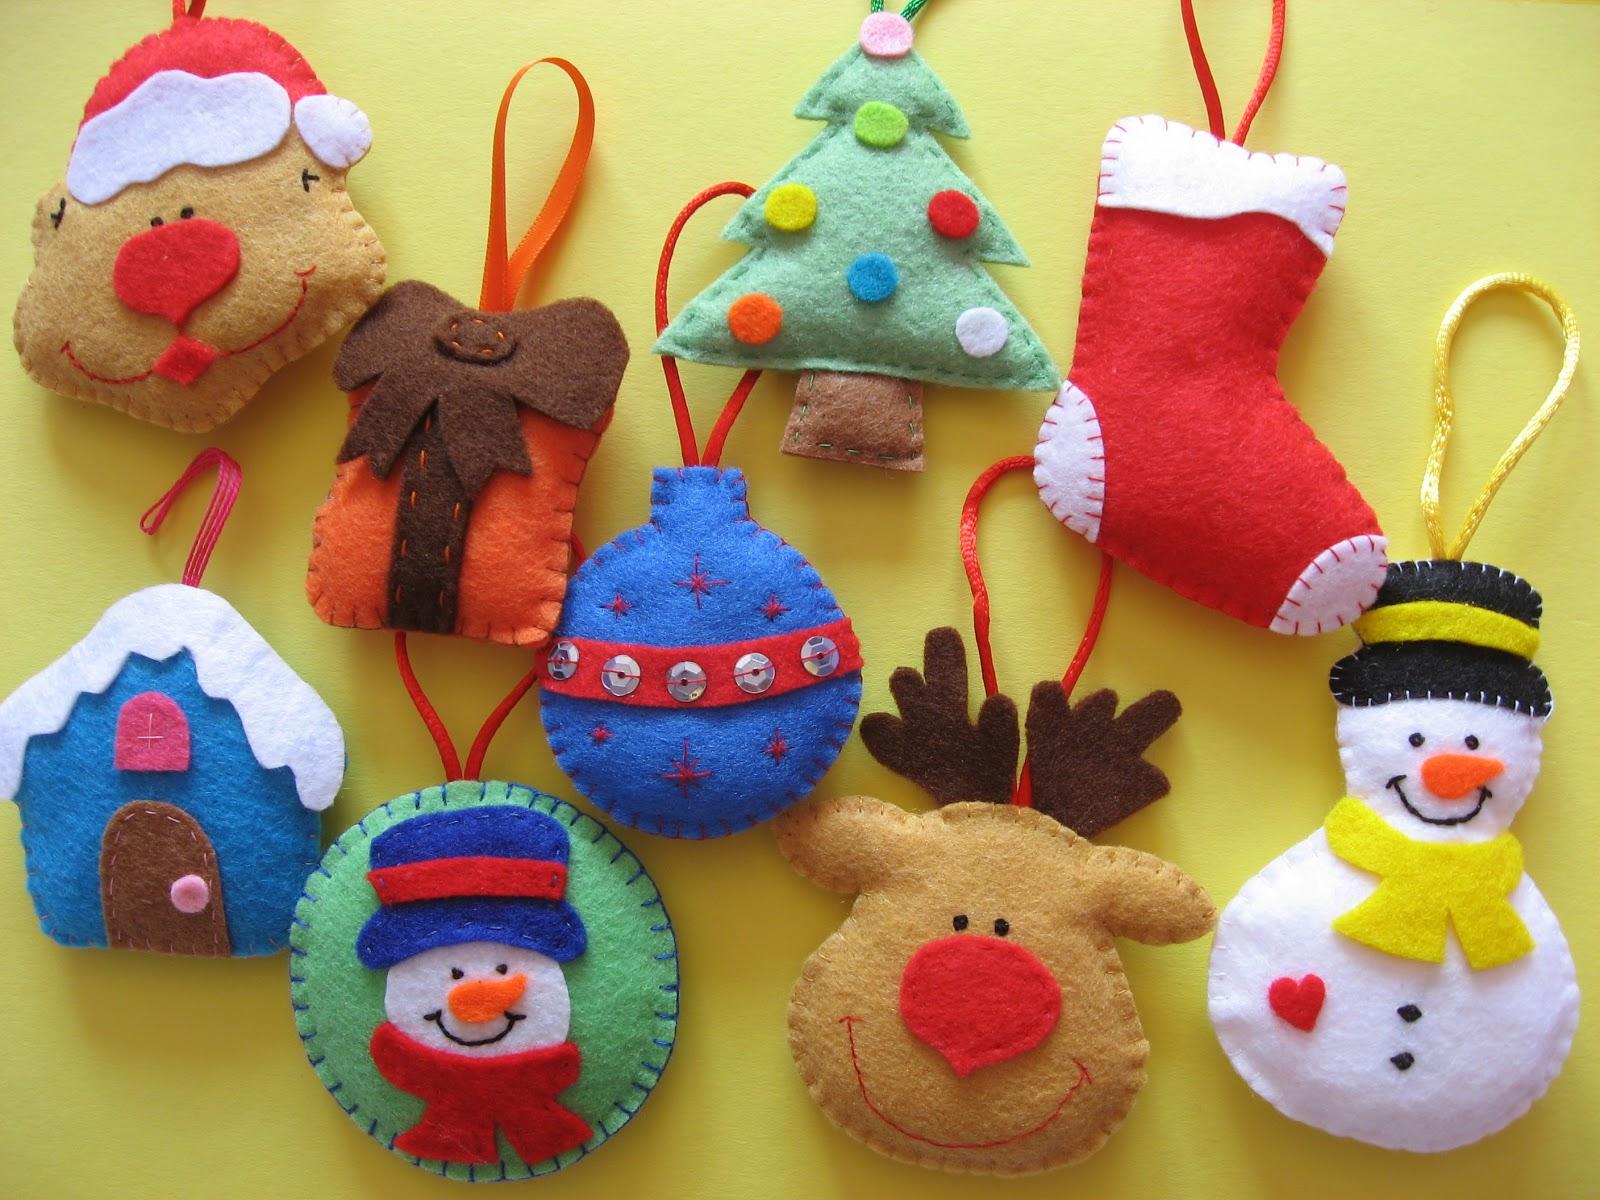 Lucky s felt adornos de navidad - Adornos para arbol navidad ...